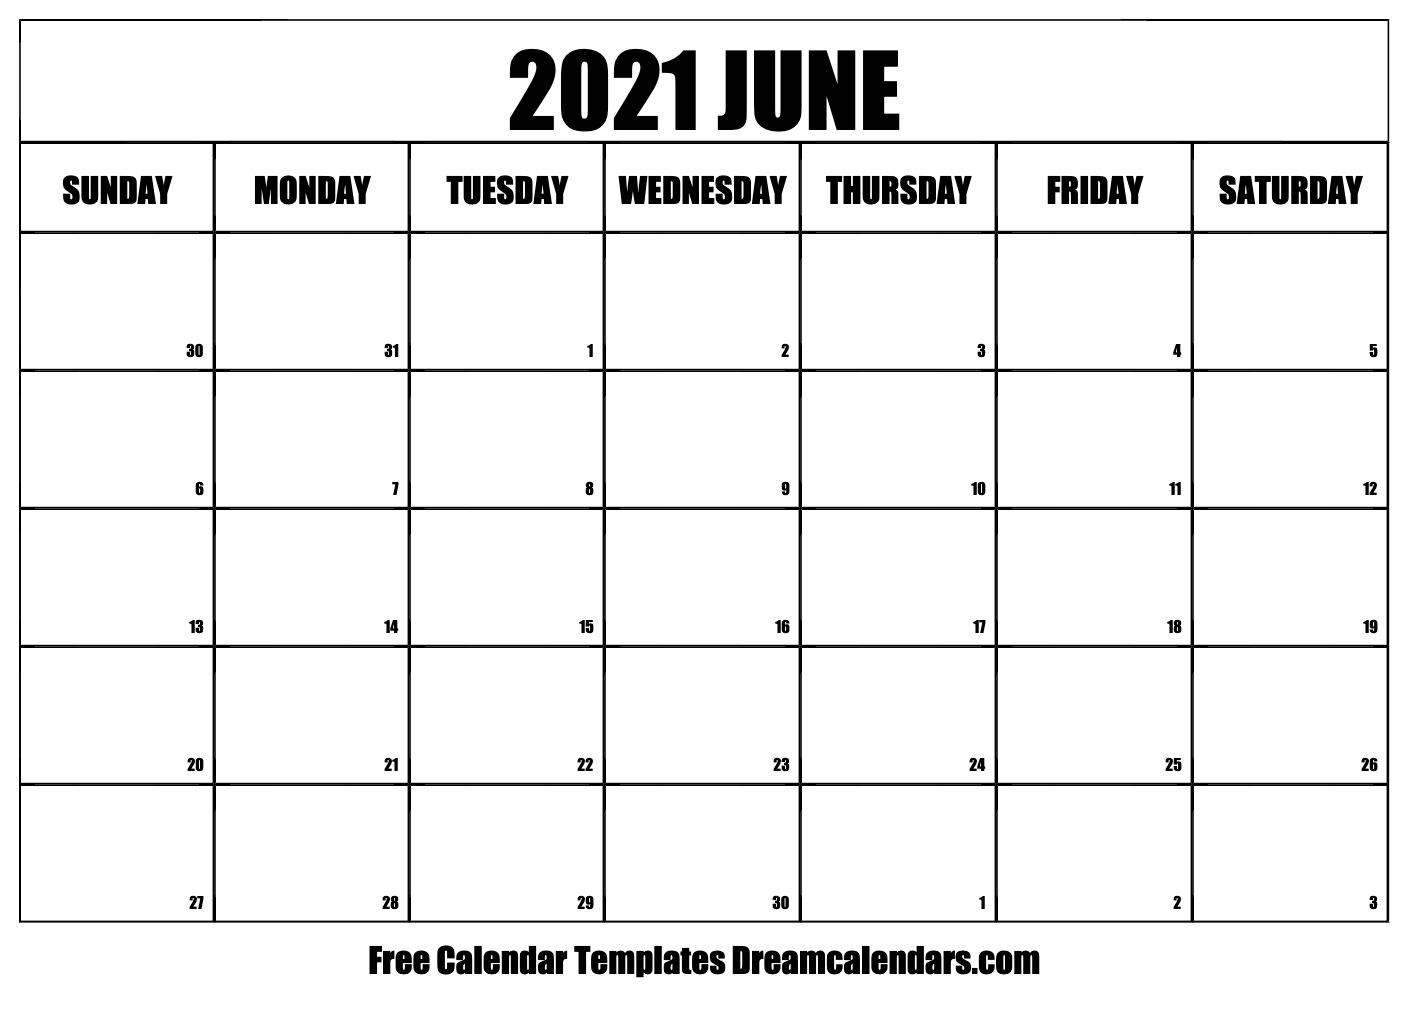 June 2021 Calendar Free Blank Printable Templates